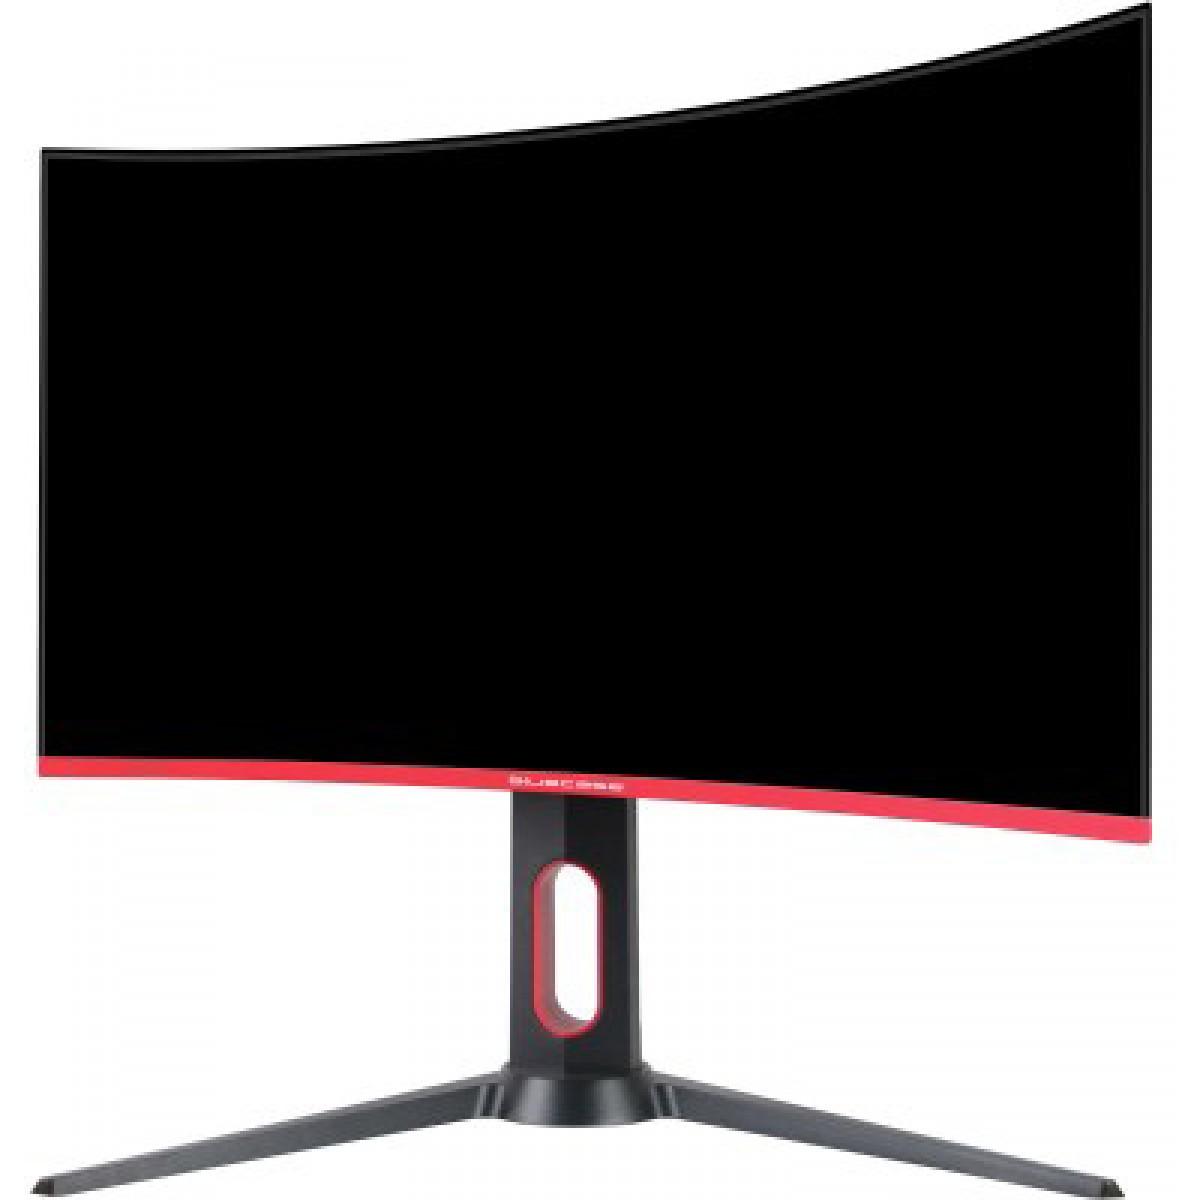 Monitor Gamer Bluecase 27 Pol, Curvo, Full HD, 165Hz, 1Ms, BM276GC